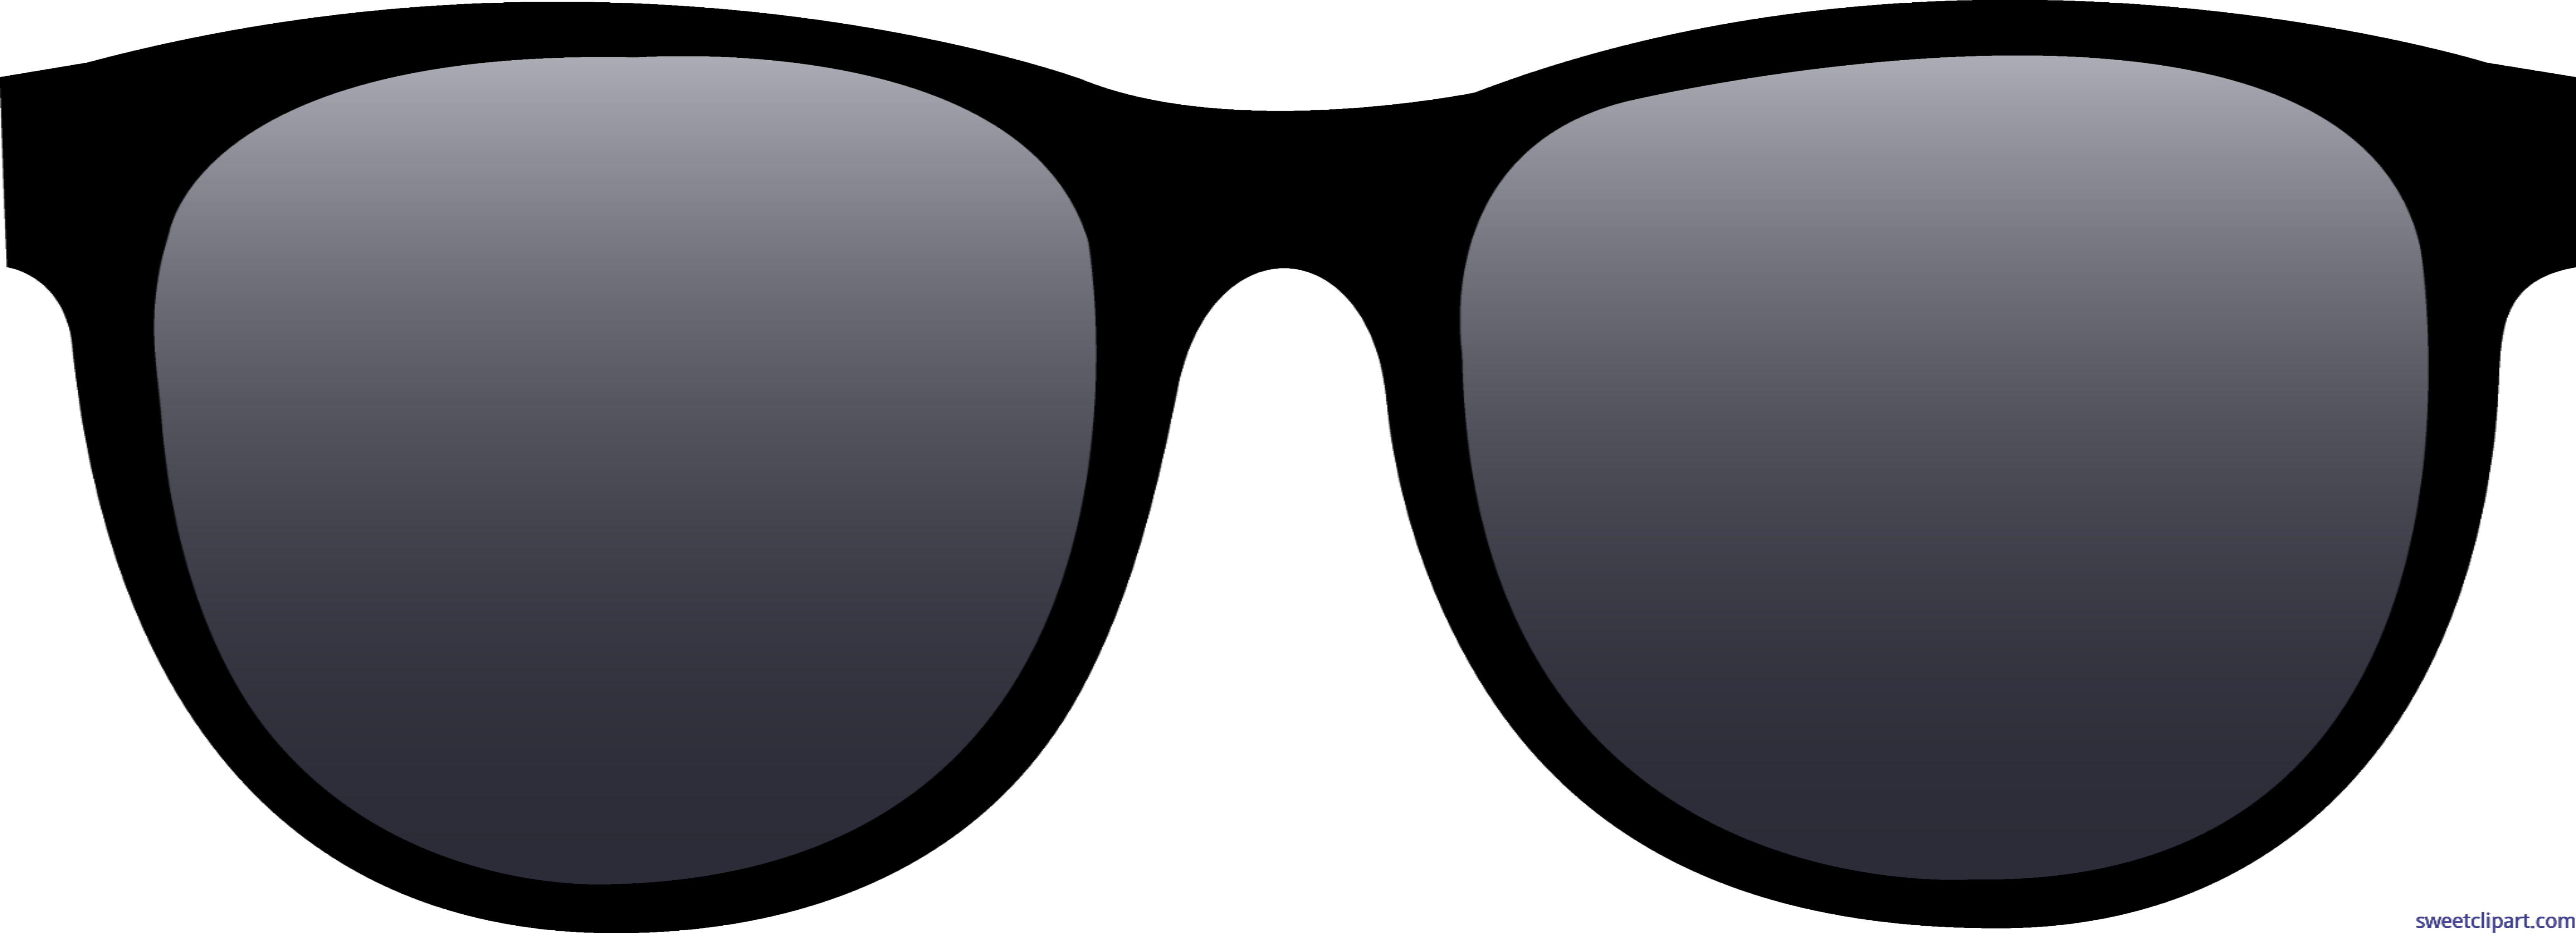 Sunglasses black. Clip art sweet